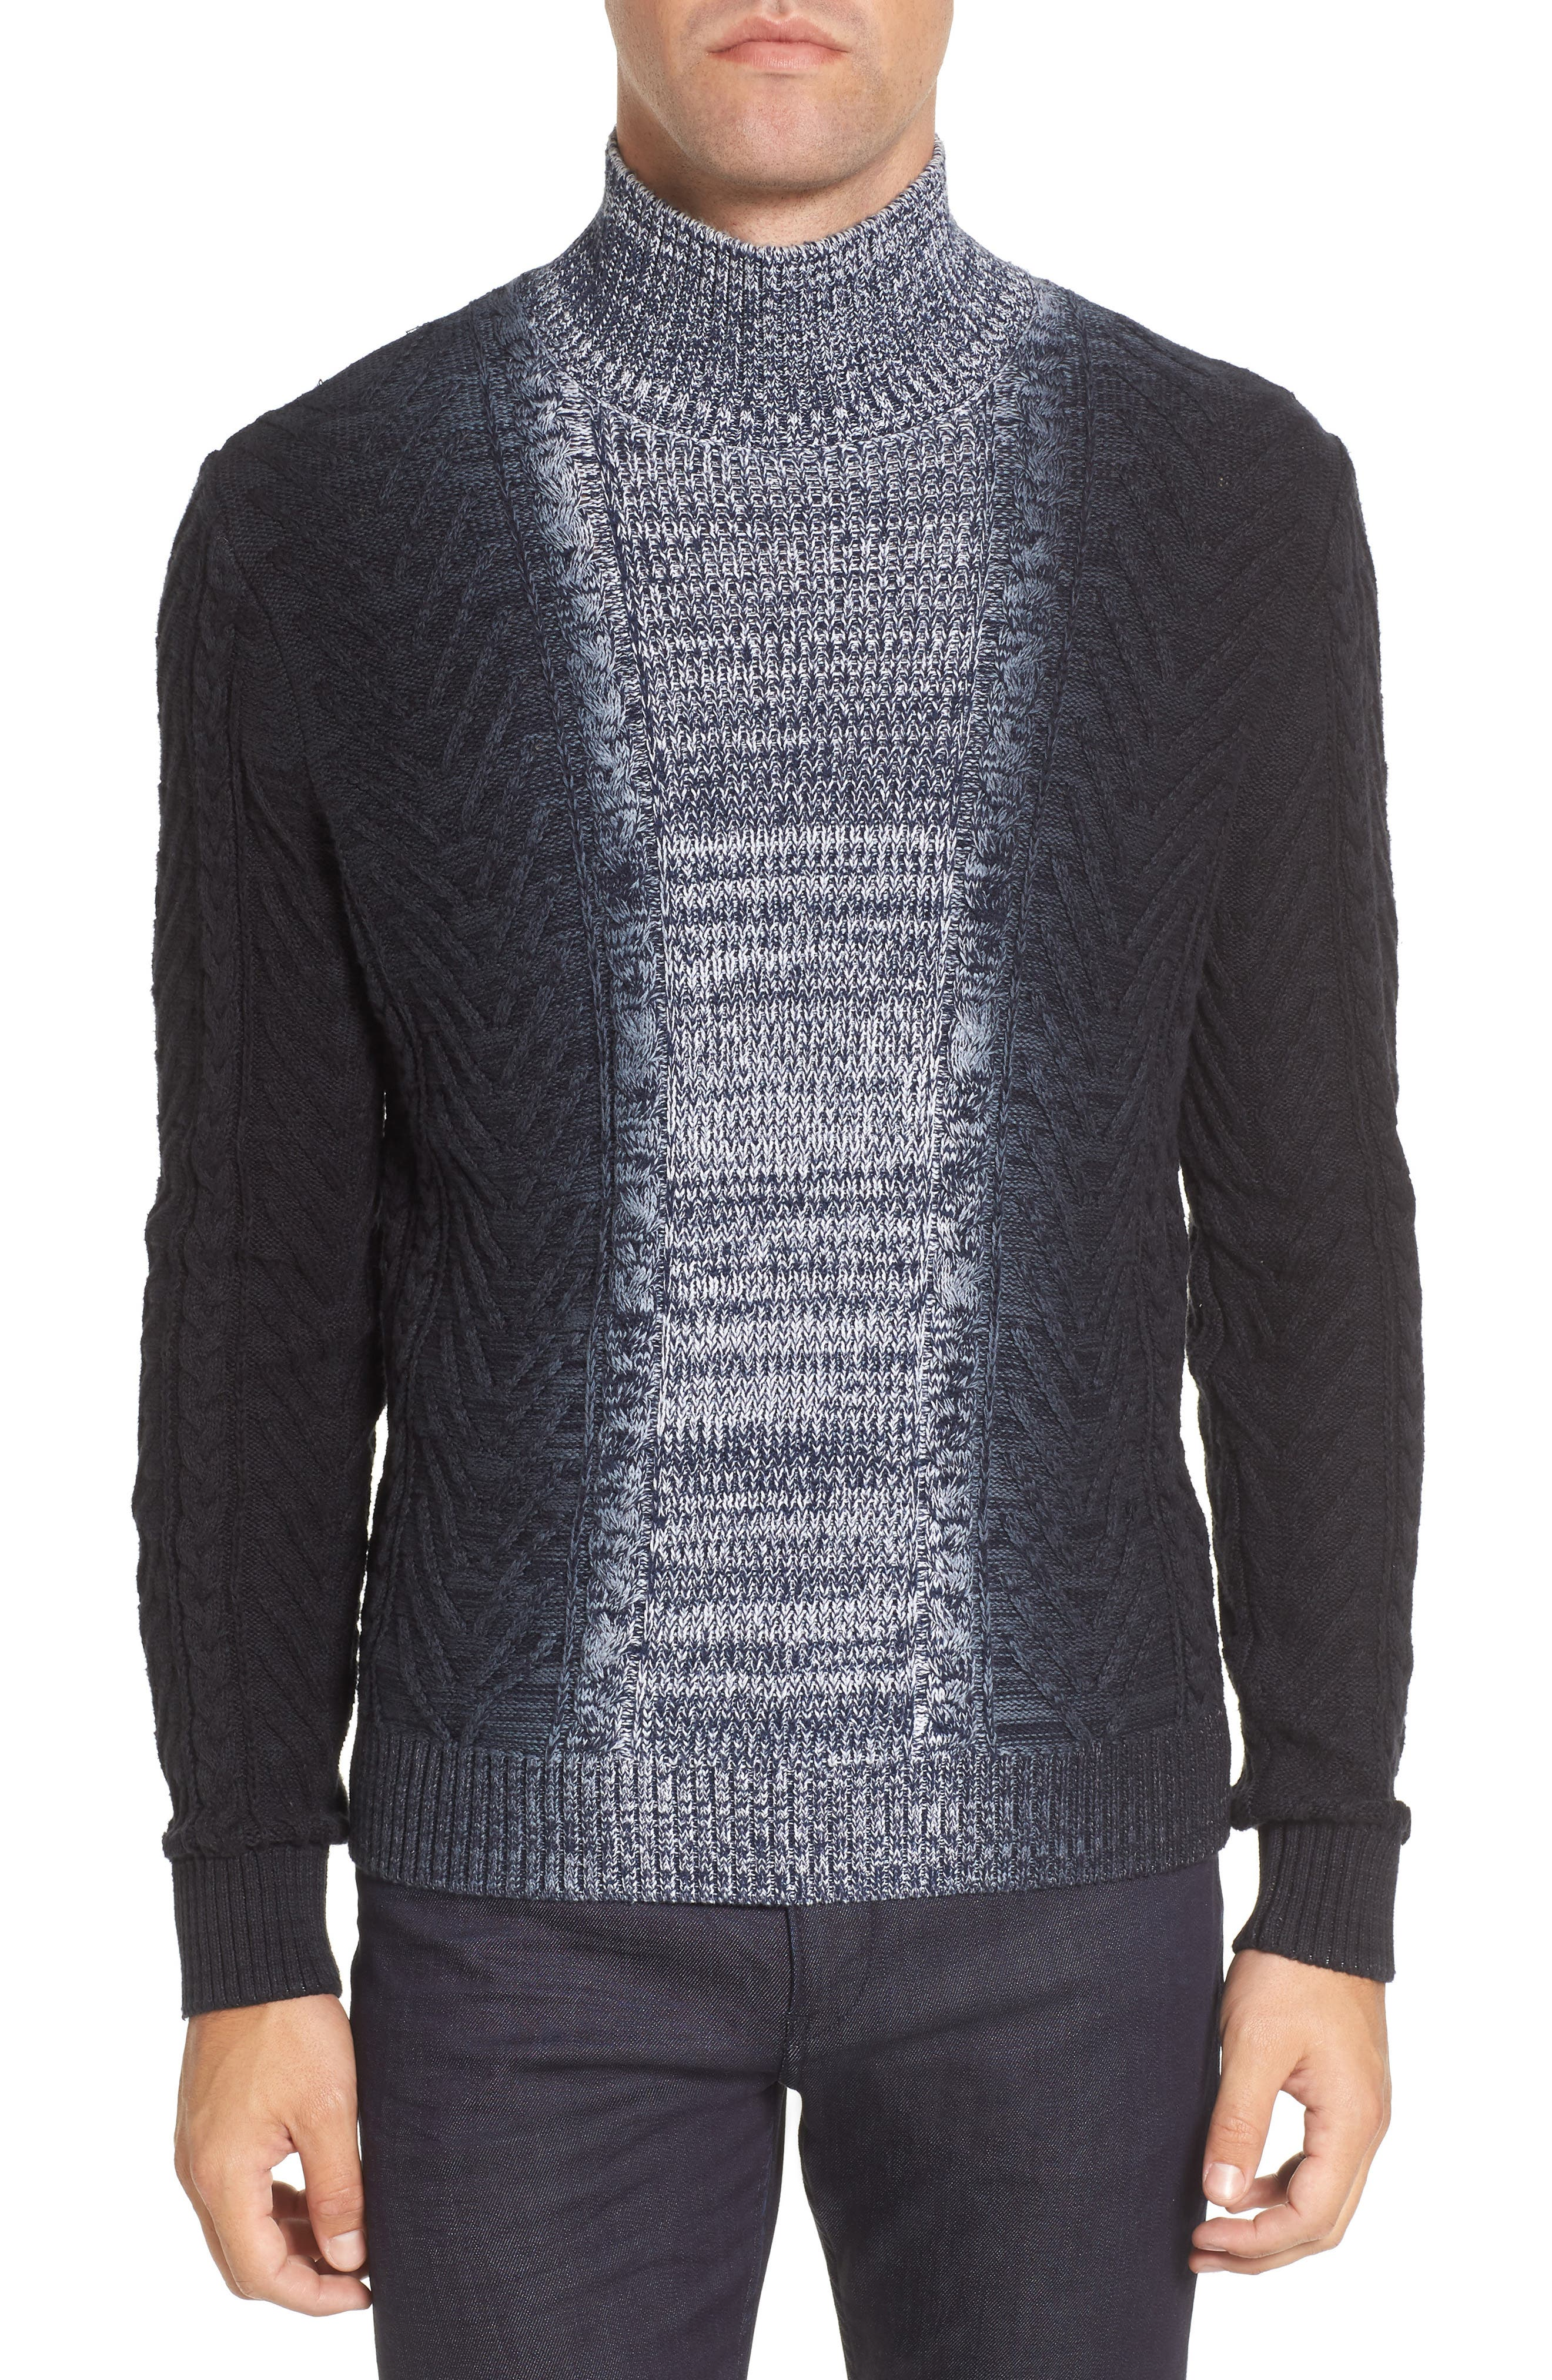 Vince Camuto Gradient Fade Turtleneck Sweater